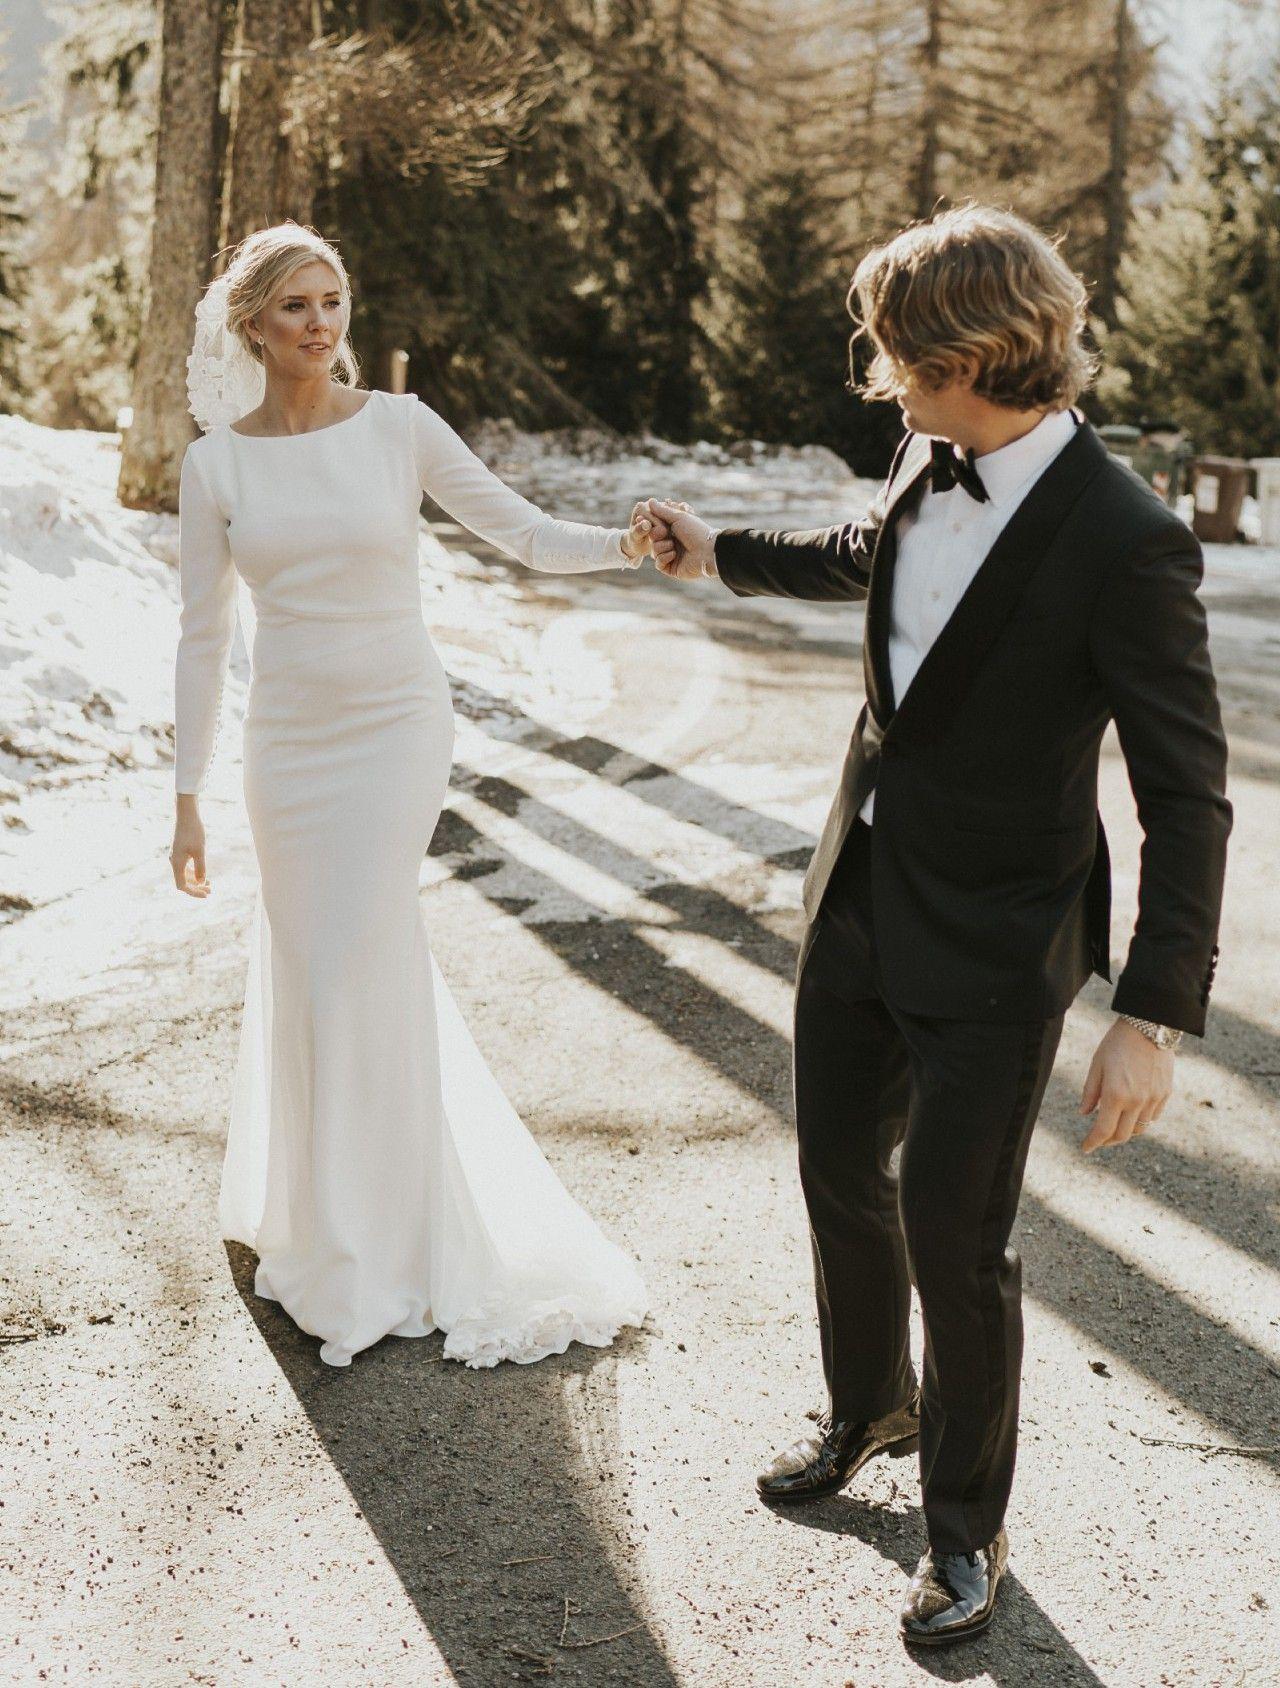 Pronovias Valeria Used Wedding Dress Save 77 Wedding Dresses Dresses Pronovias Wedding Dress [ 1688 x 1280 Pixel ]